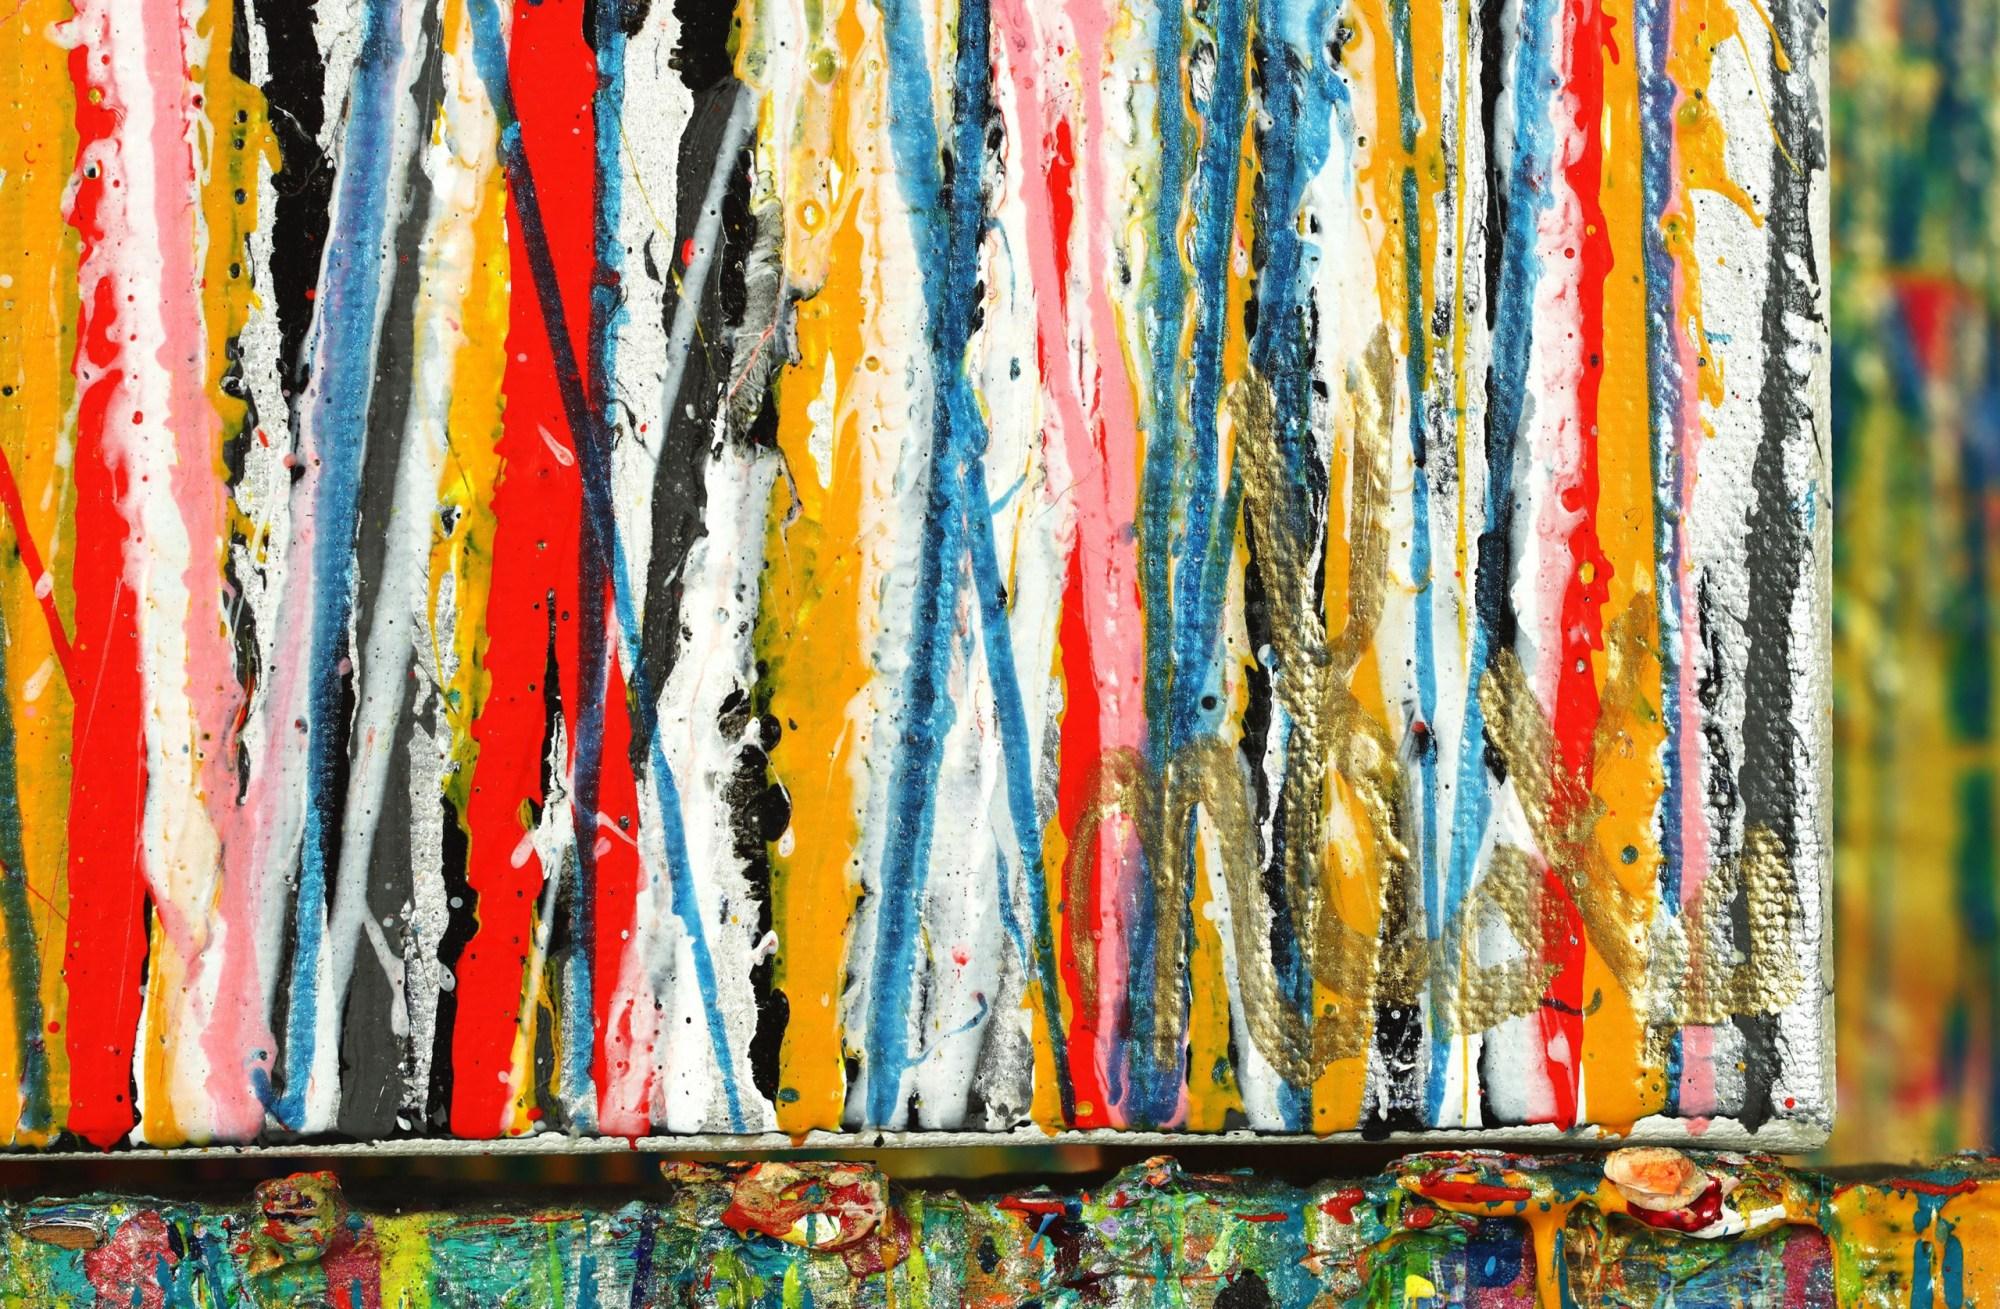 SIGNATURE - Dream Sequence 1 (2021) / Multi-canvas work by Nestor Toro